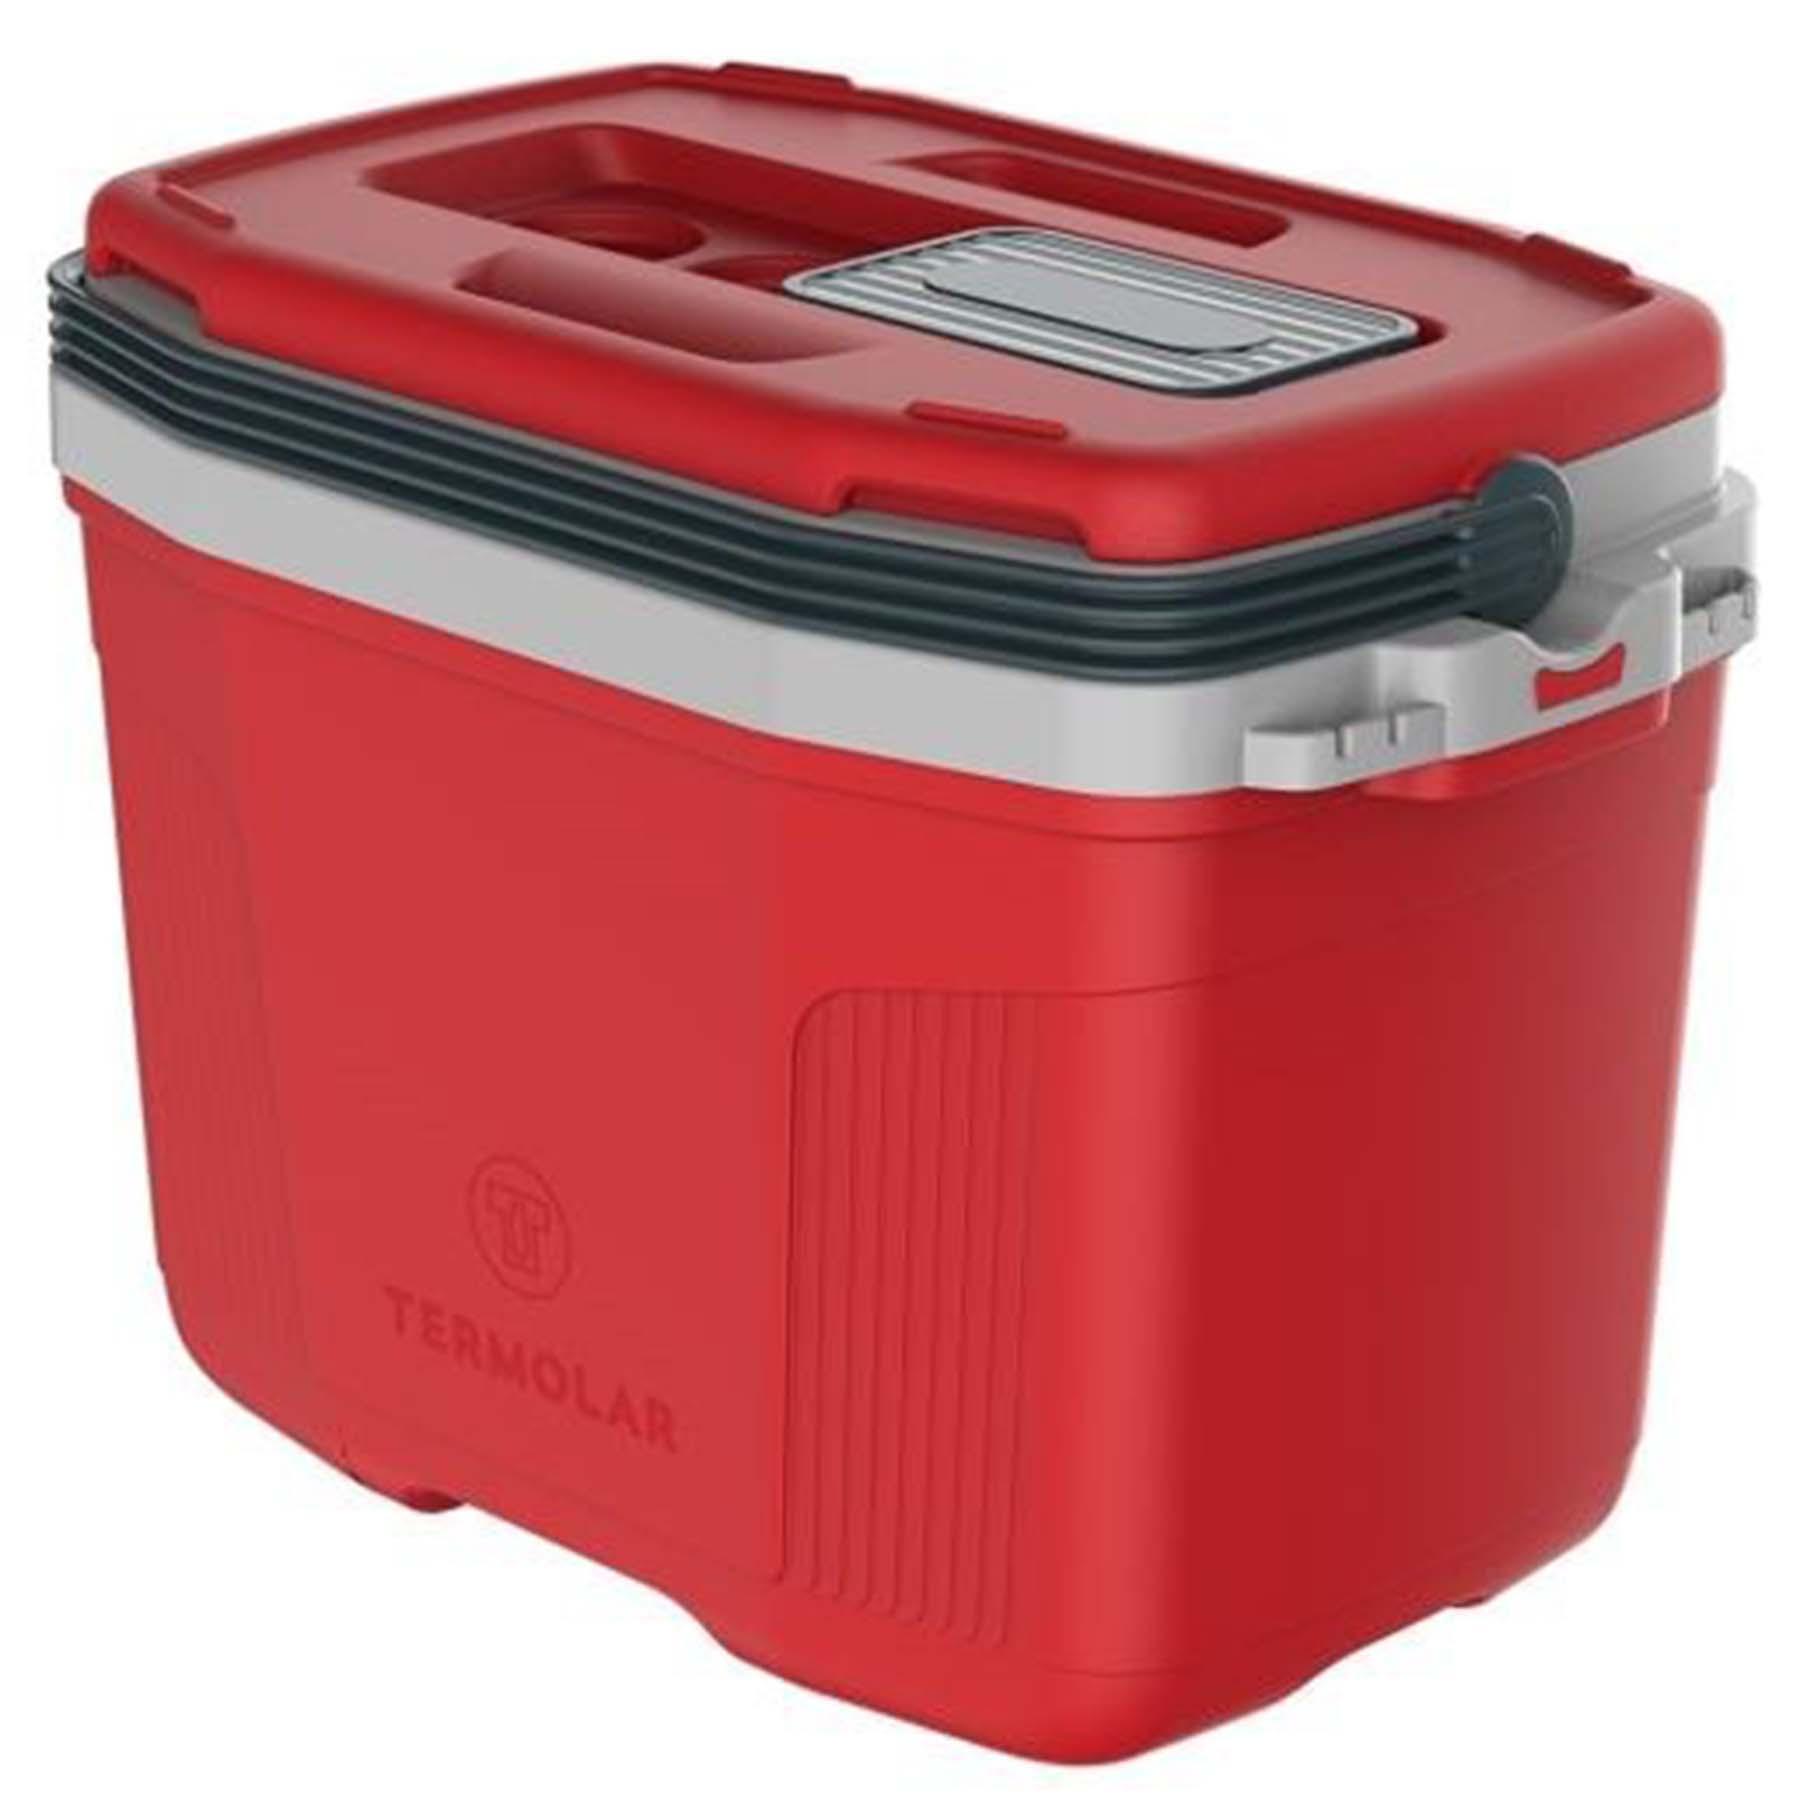 Caixa Térmica SUV 32L Vermelha Termolar 3502VRO